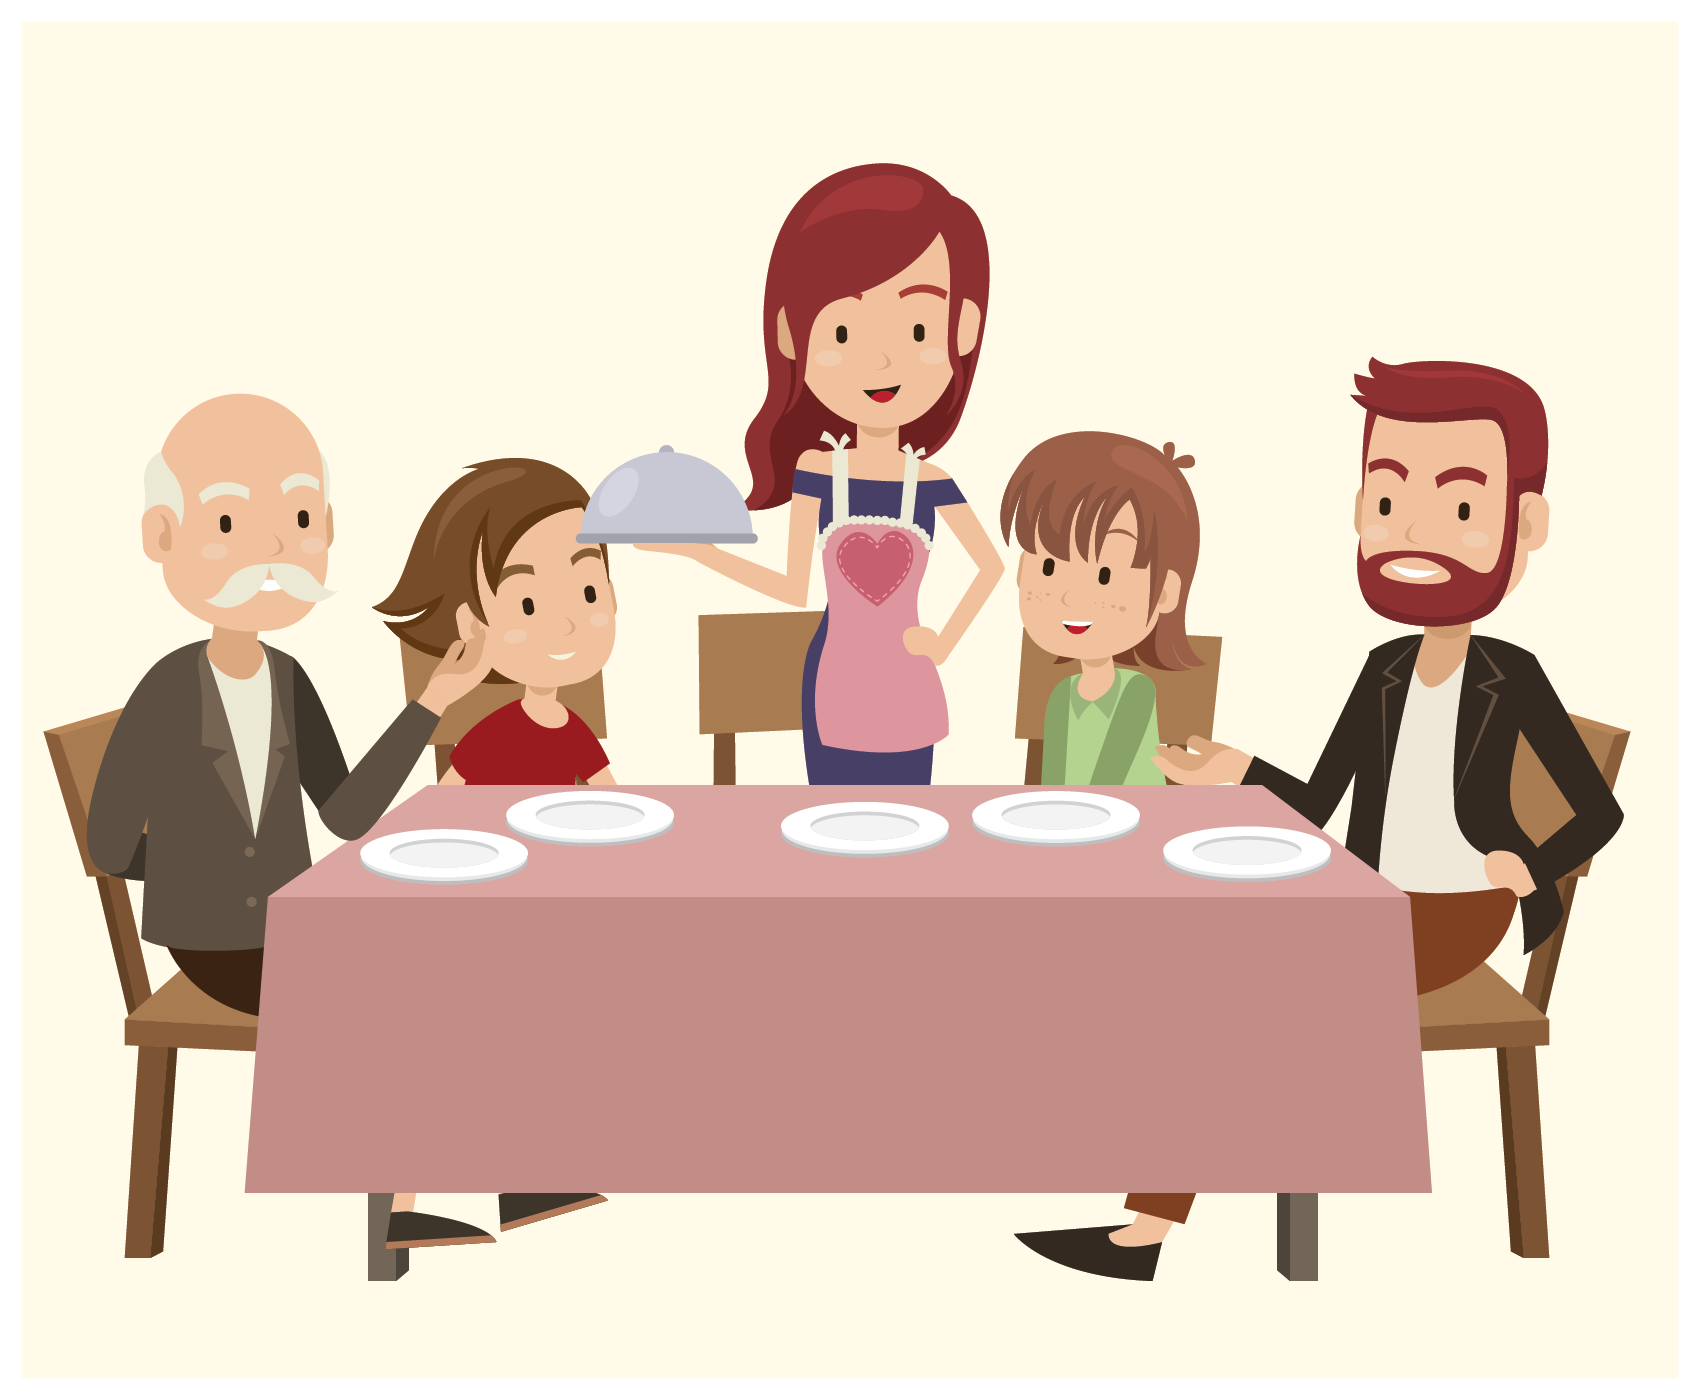 Family Dinner Free Vector Art - (8,239 Free Downloads)